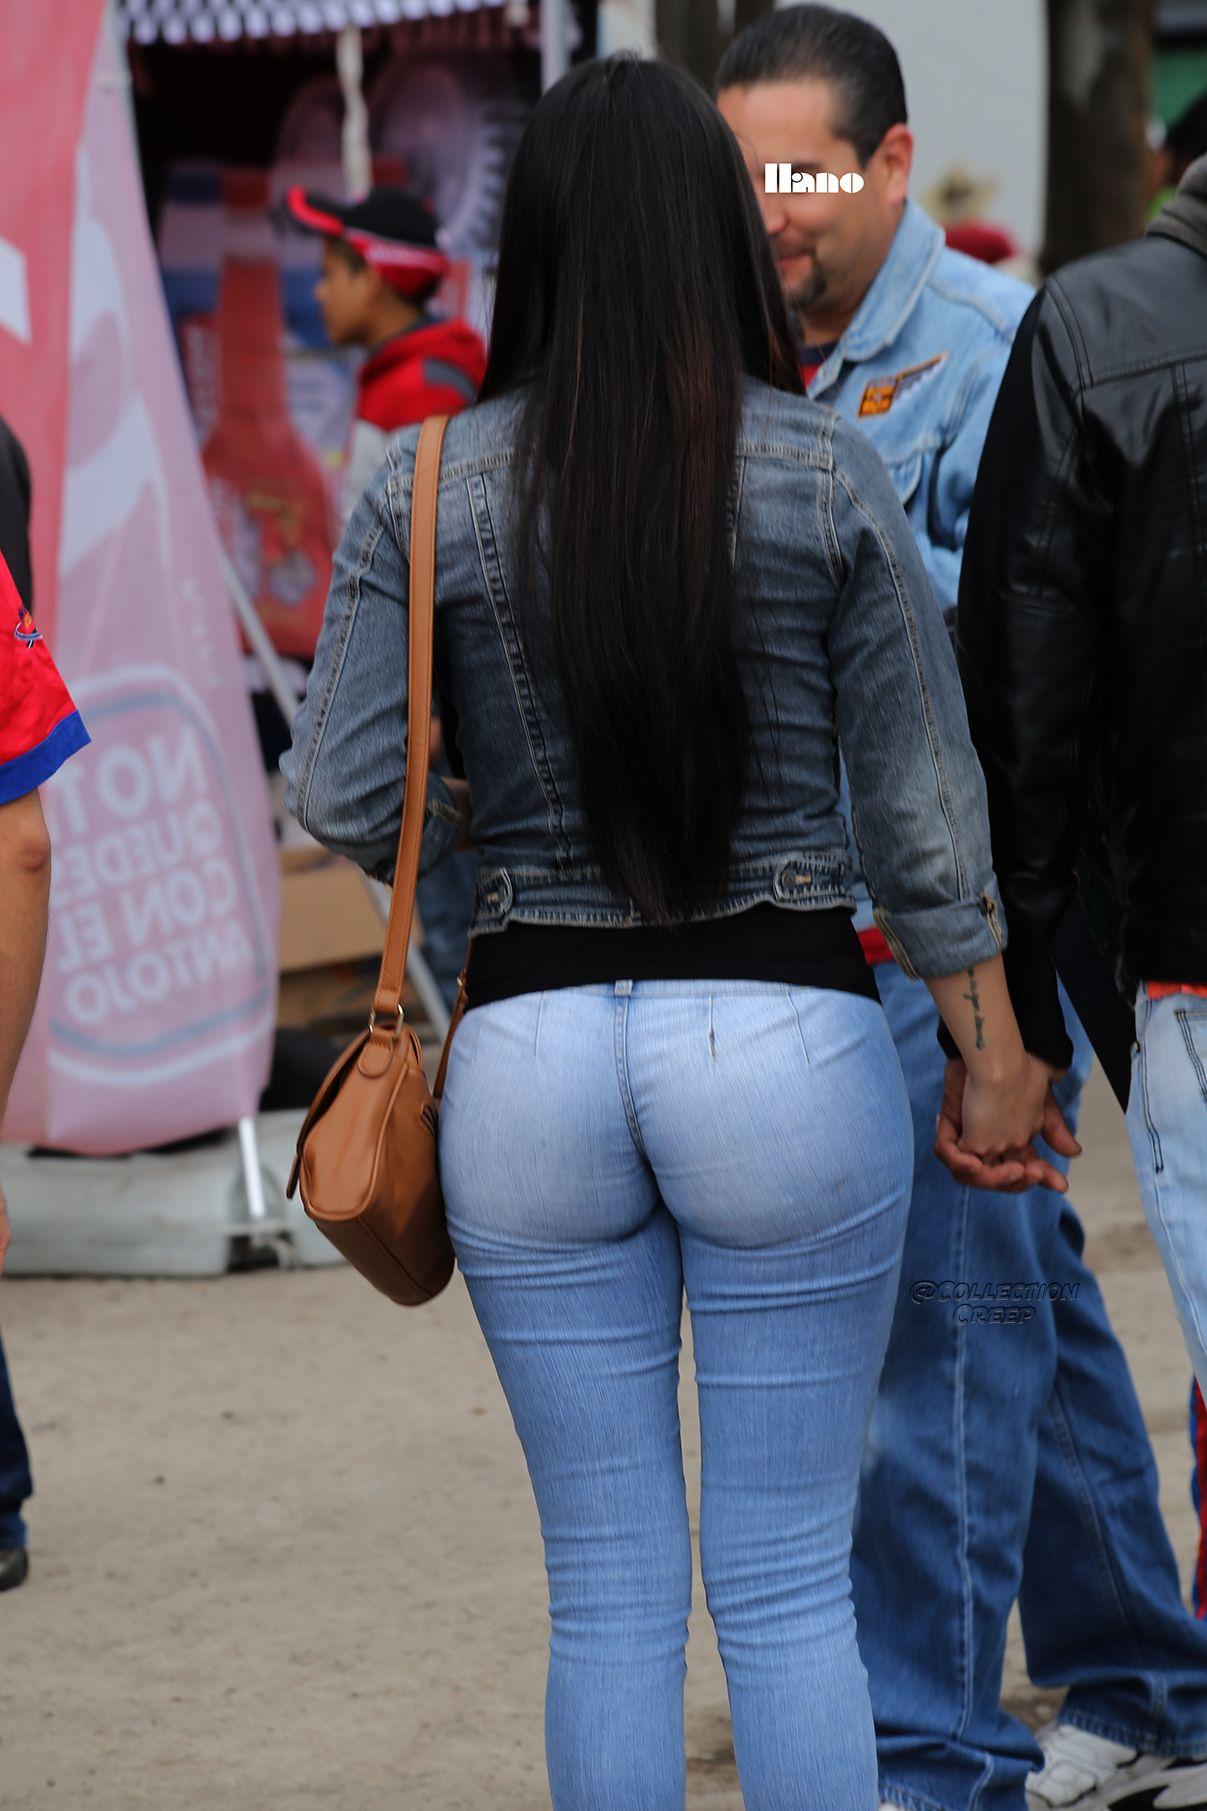 Sexy milf in jeans vpl